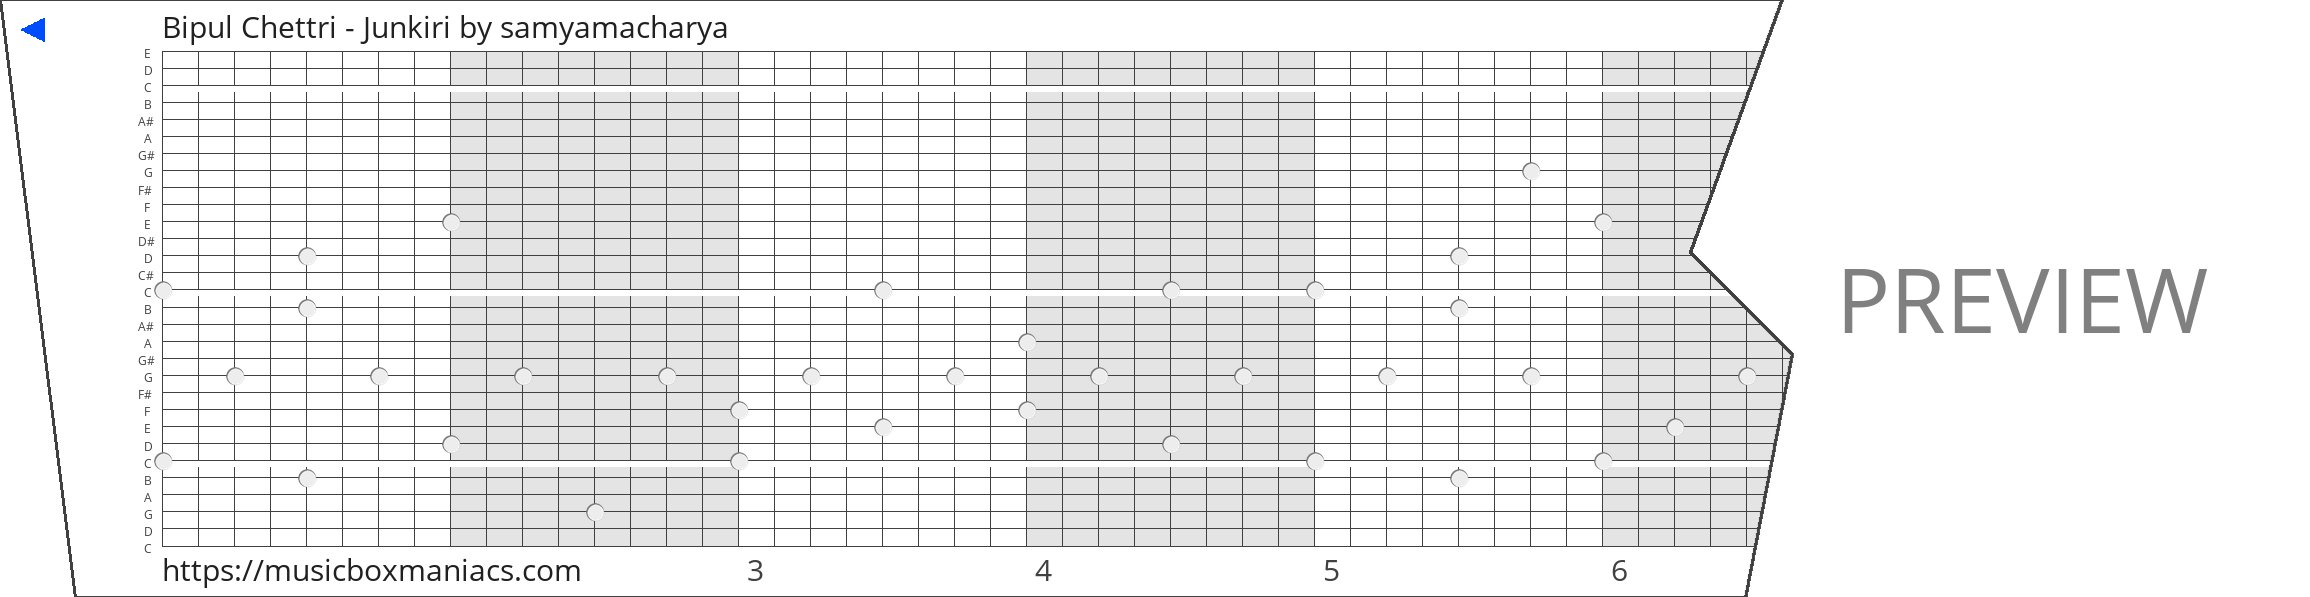 Bipul Chettri - Junkiri 30 note music box paper strip